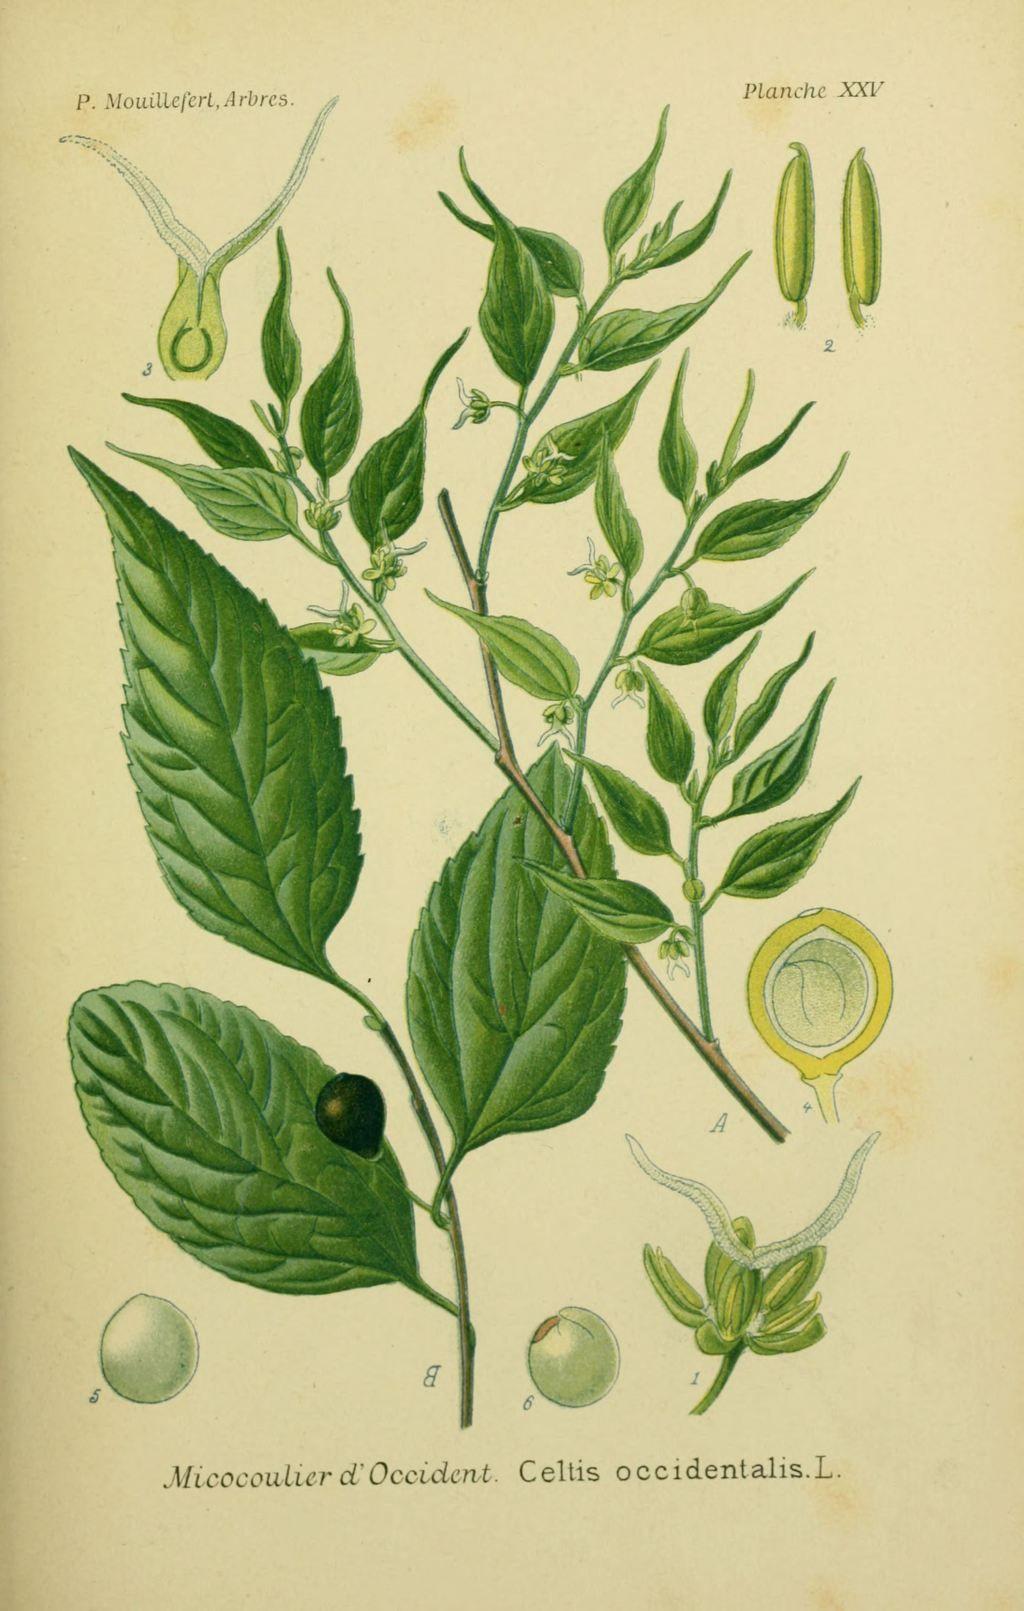 img/dessins arbres arbrisseaux/dessins arbres et arbrisseaux 0091 micocoulier d occident - celtis occidentalis.jpg